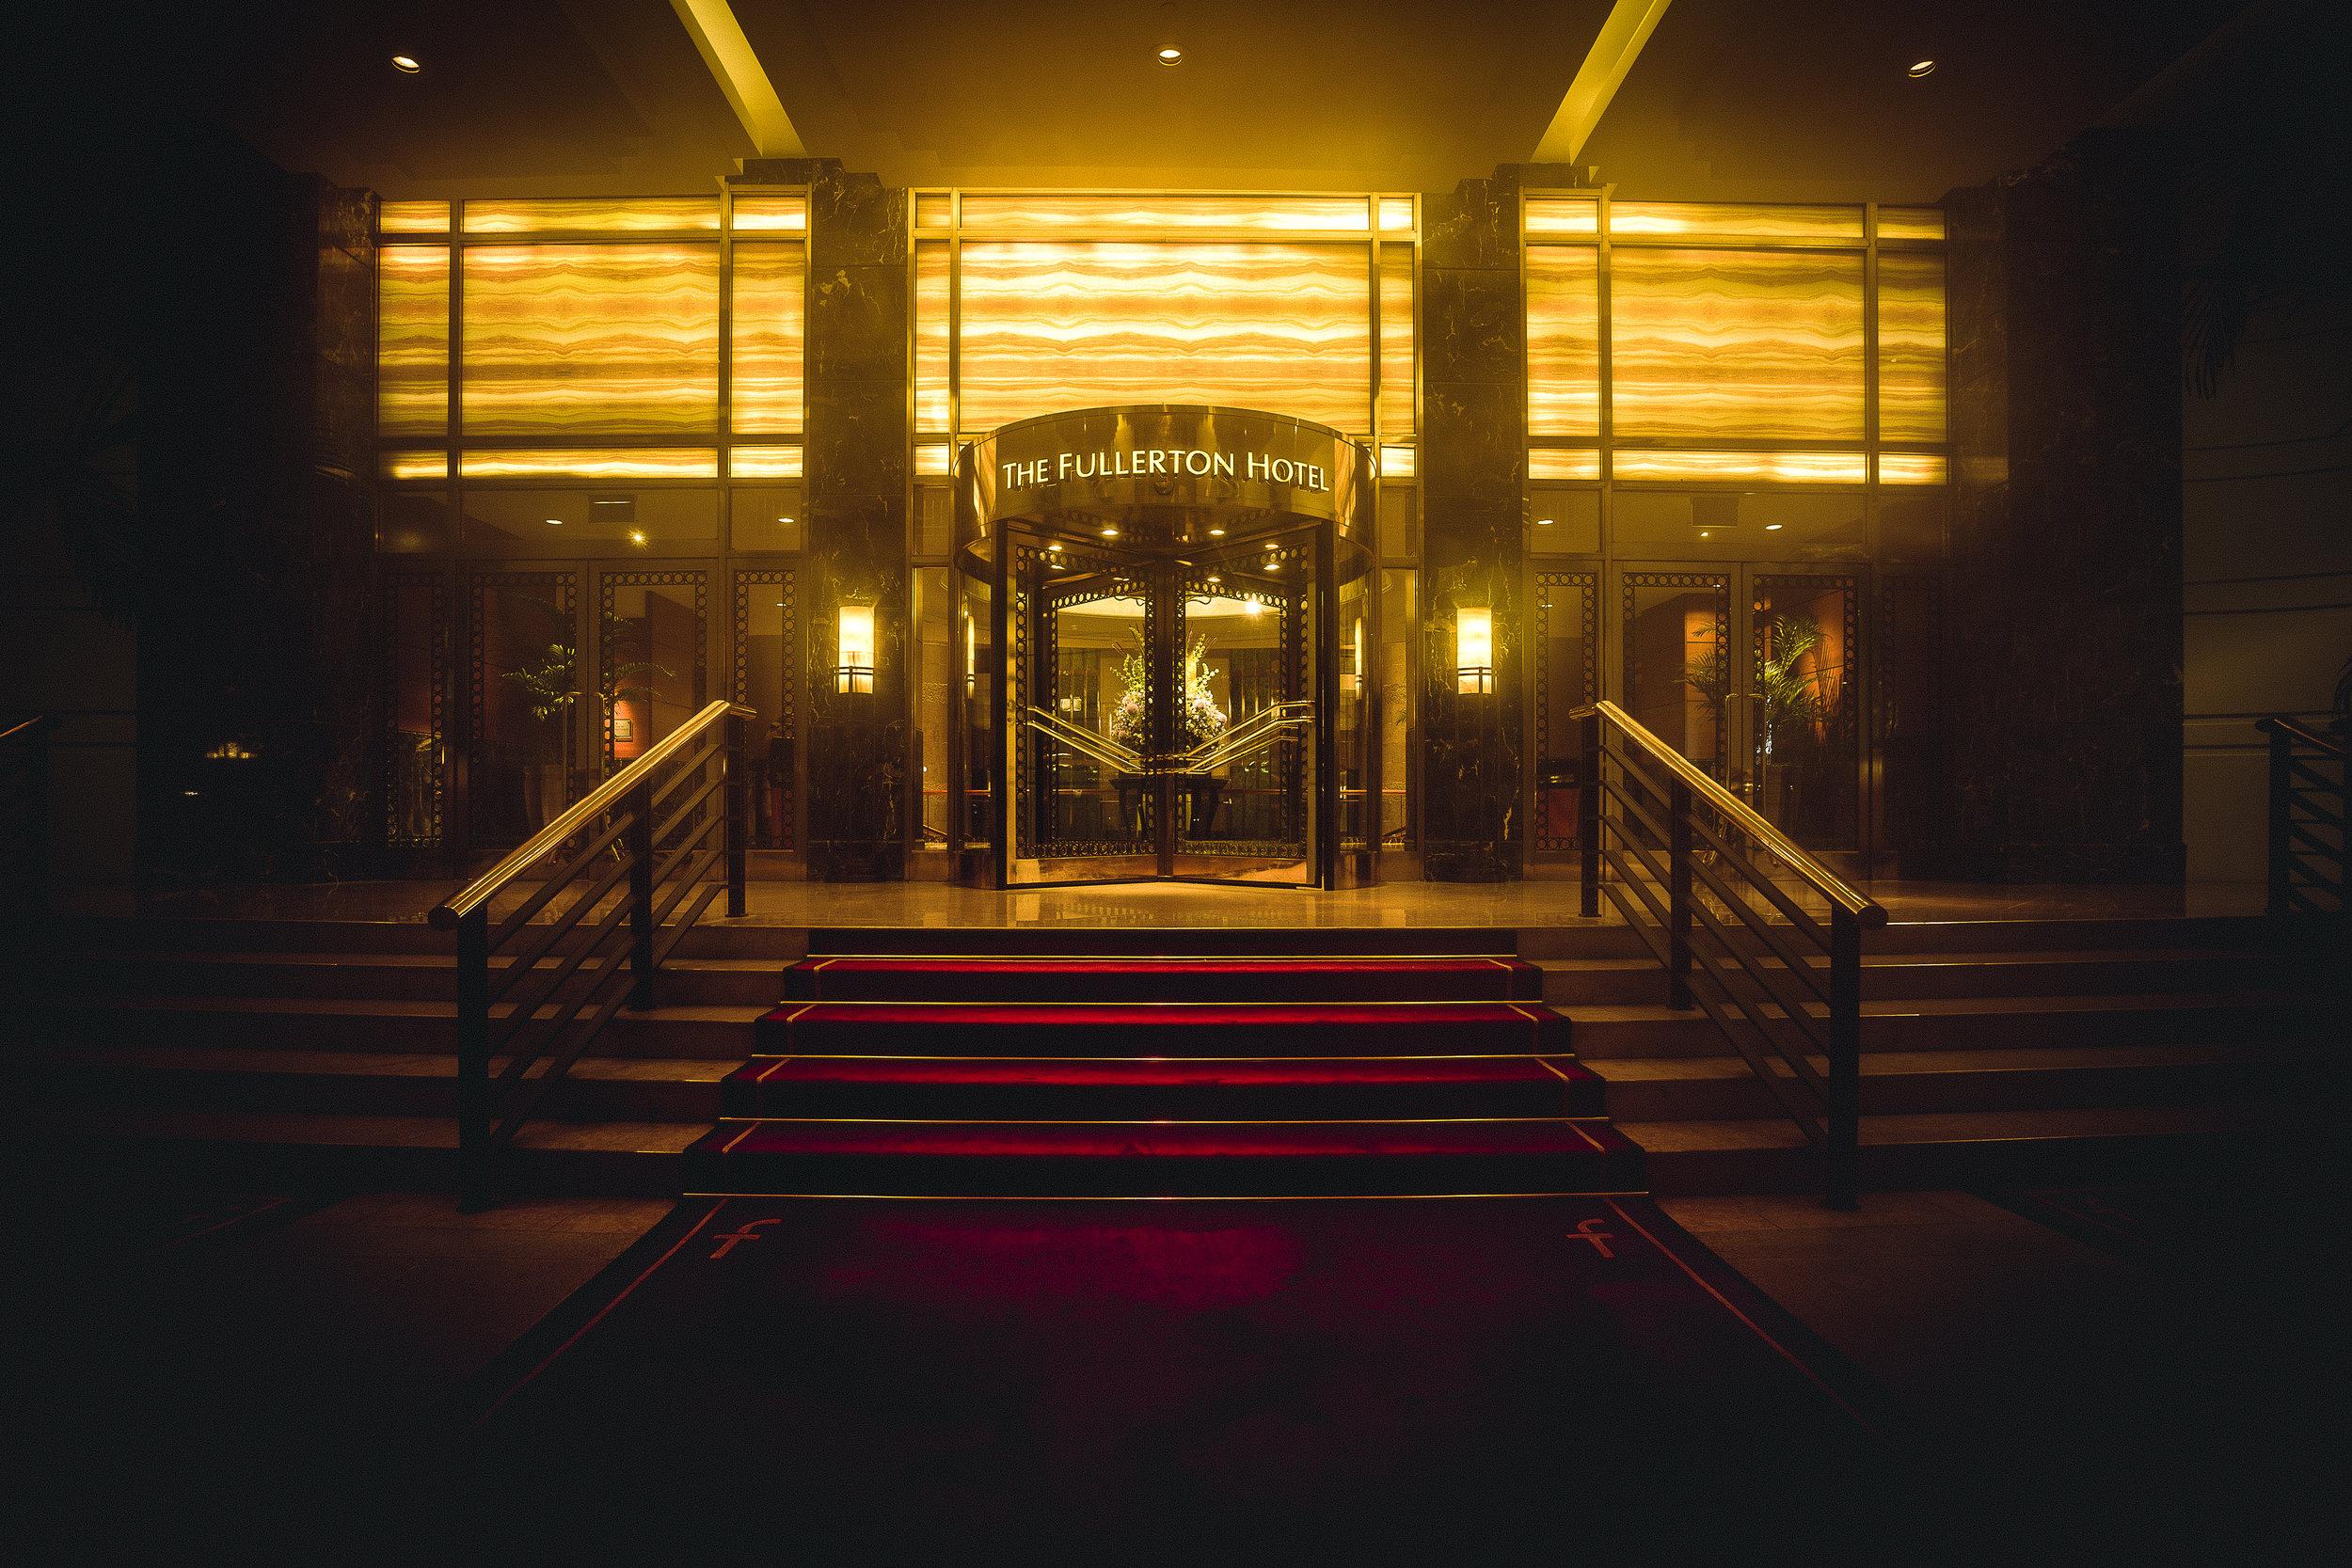 Fullerton Hotel Singapore - Let's Go Bravo - Eric Bravo Photography